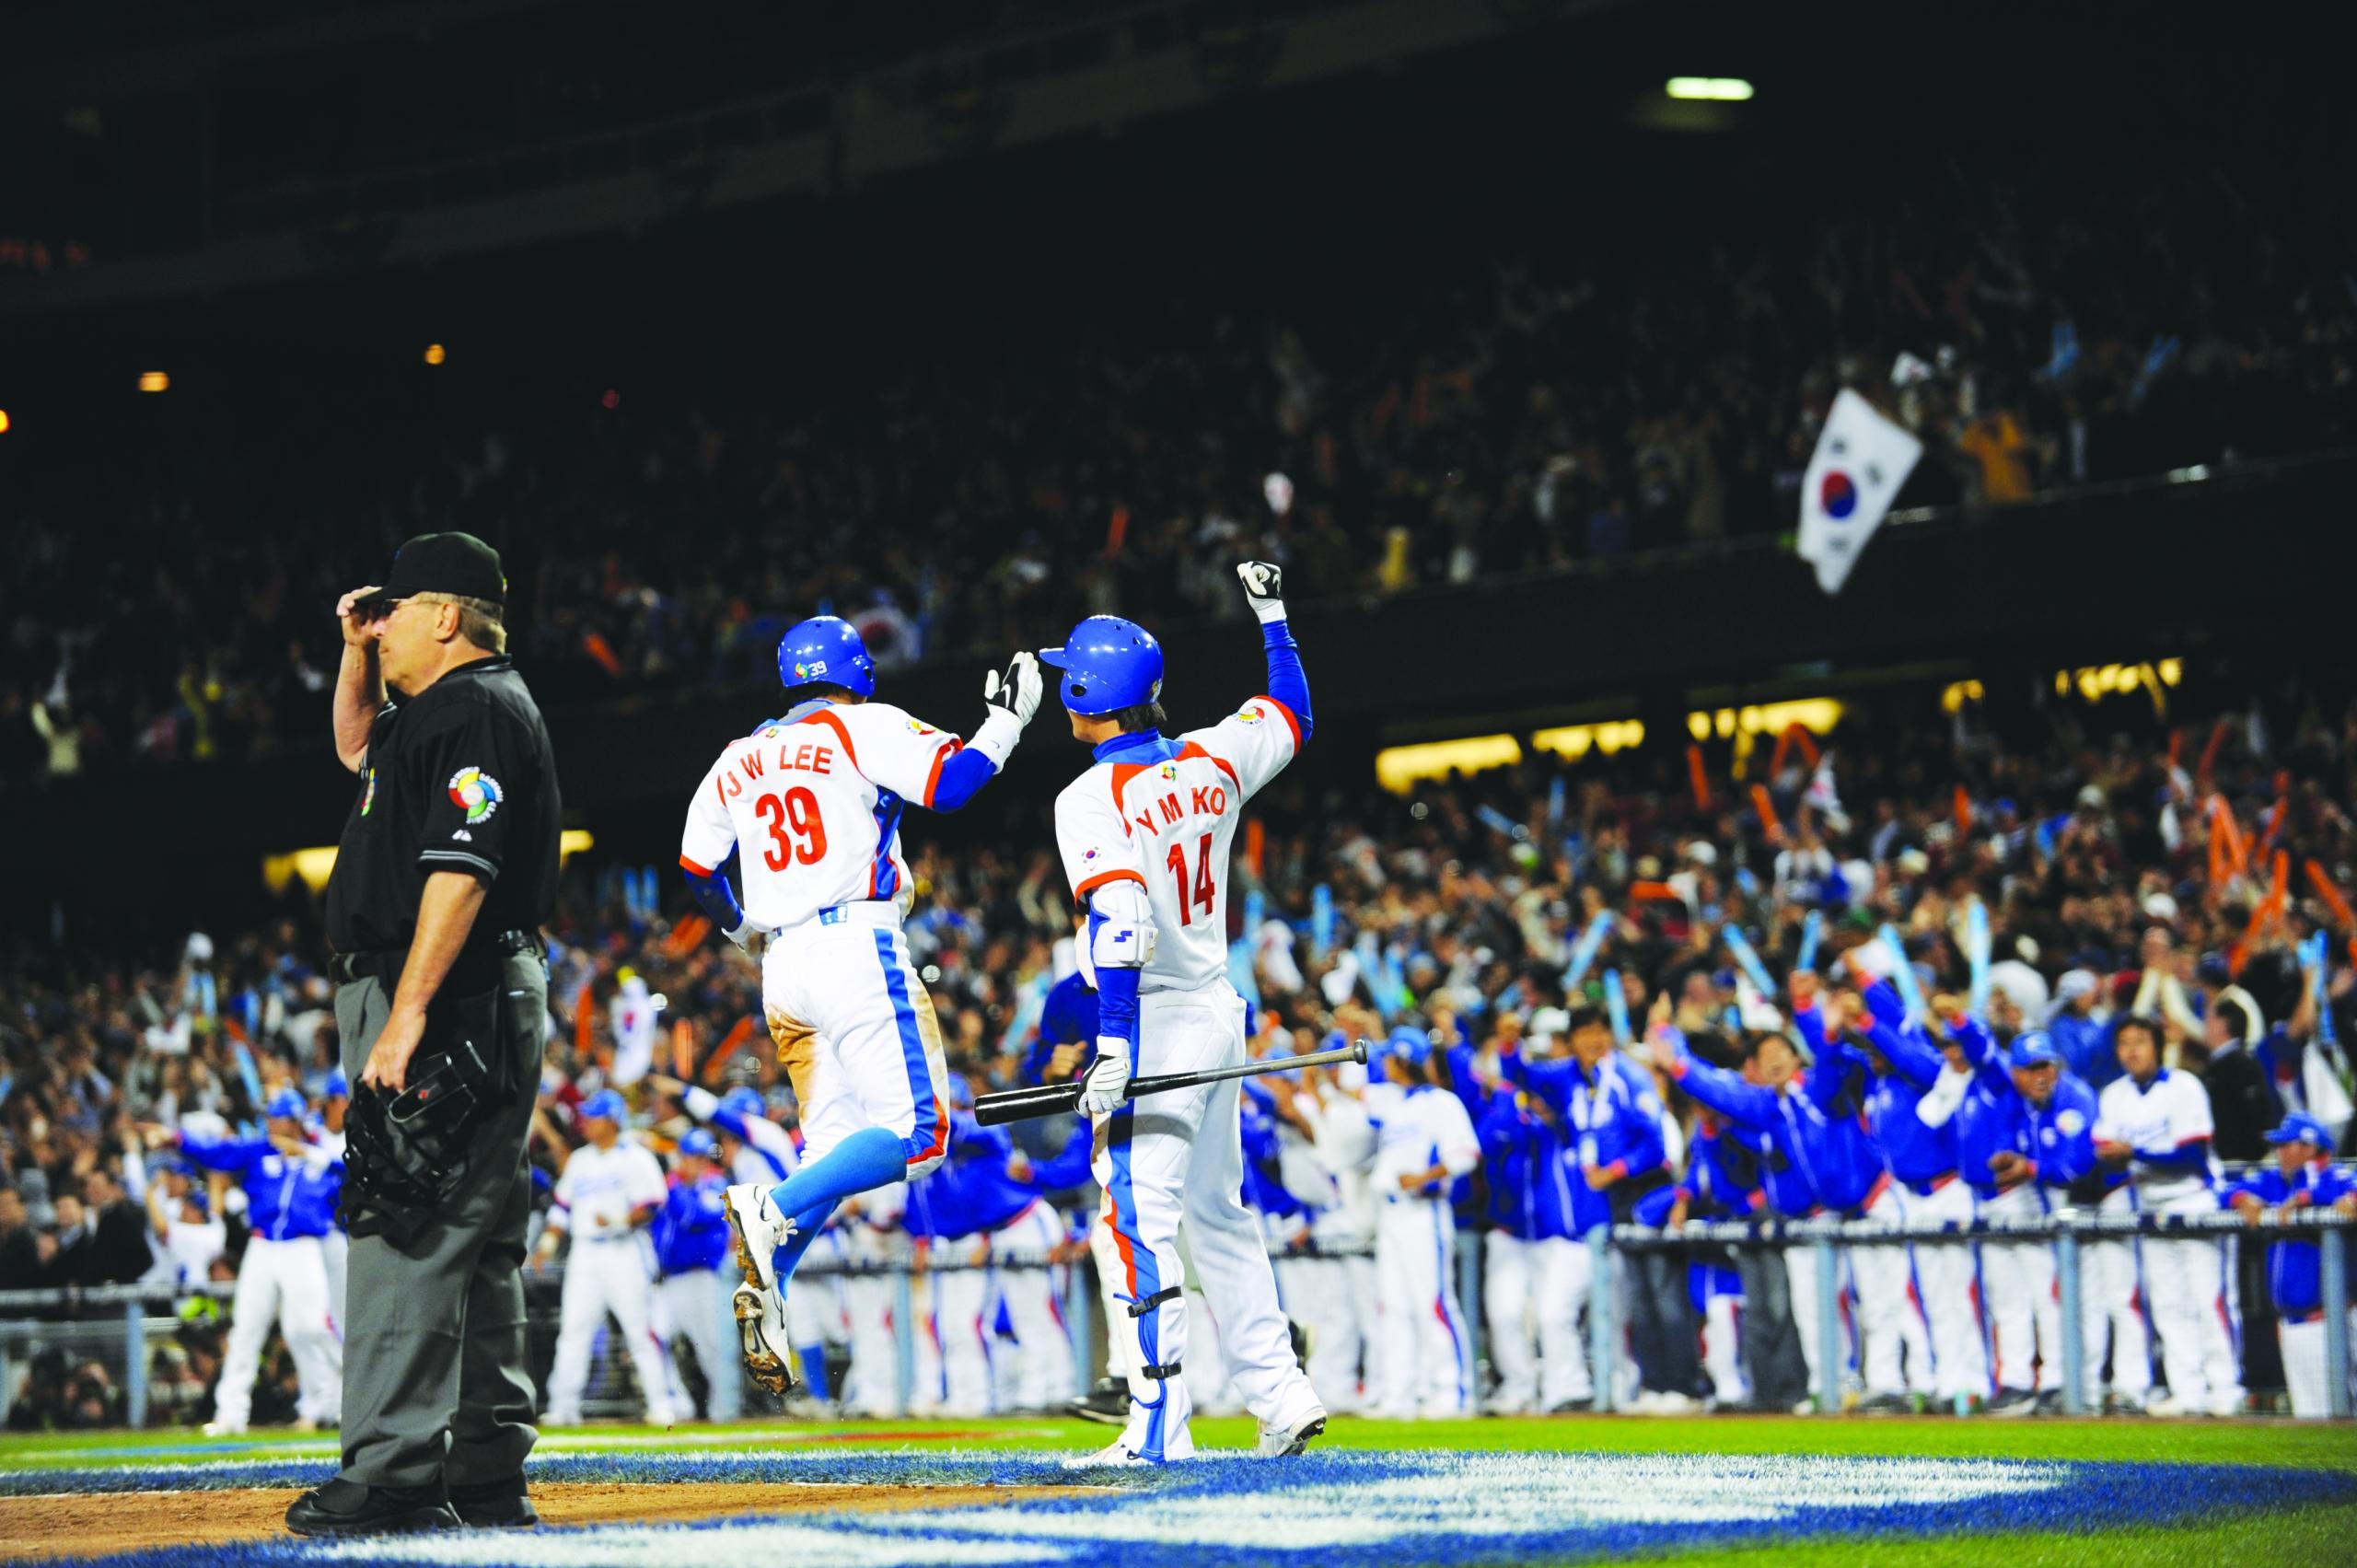 Team Korea celebrates during the 2009 World Baseball Classic final at Dodger Stadium (JUAN OCAMPO / LOS ANGELES DODGERS)